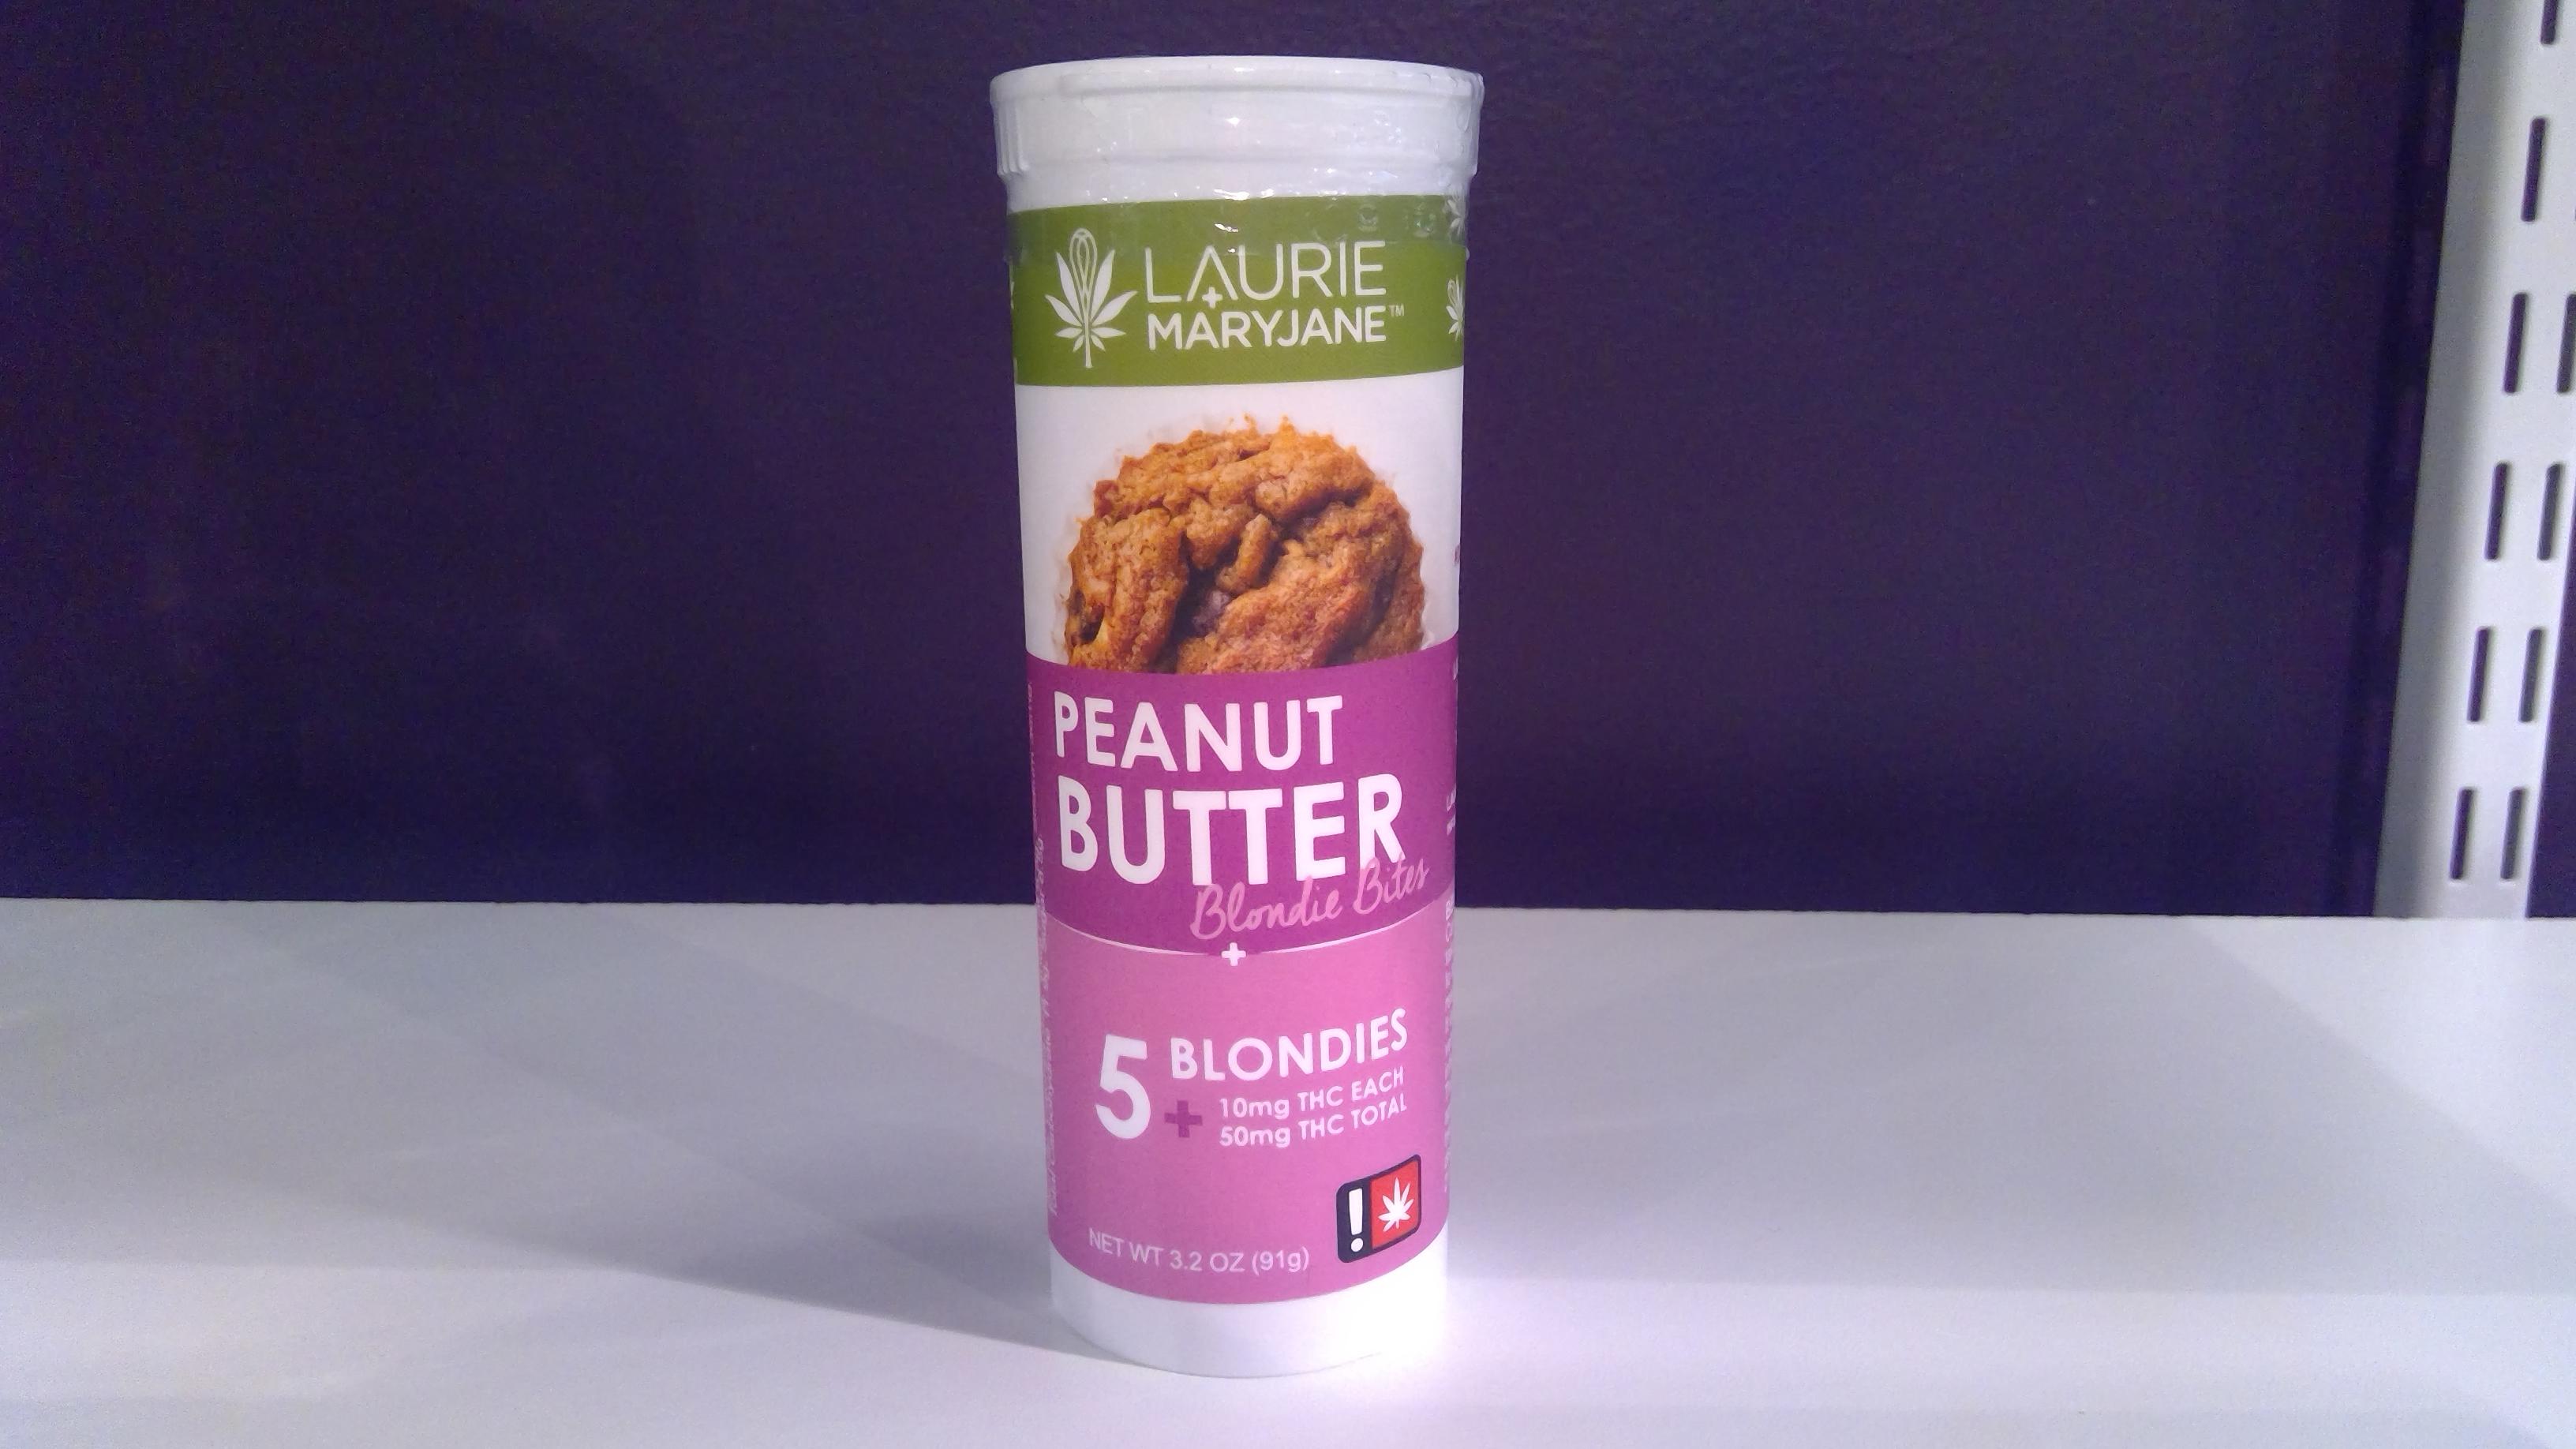 Peanut Butter Blondies image